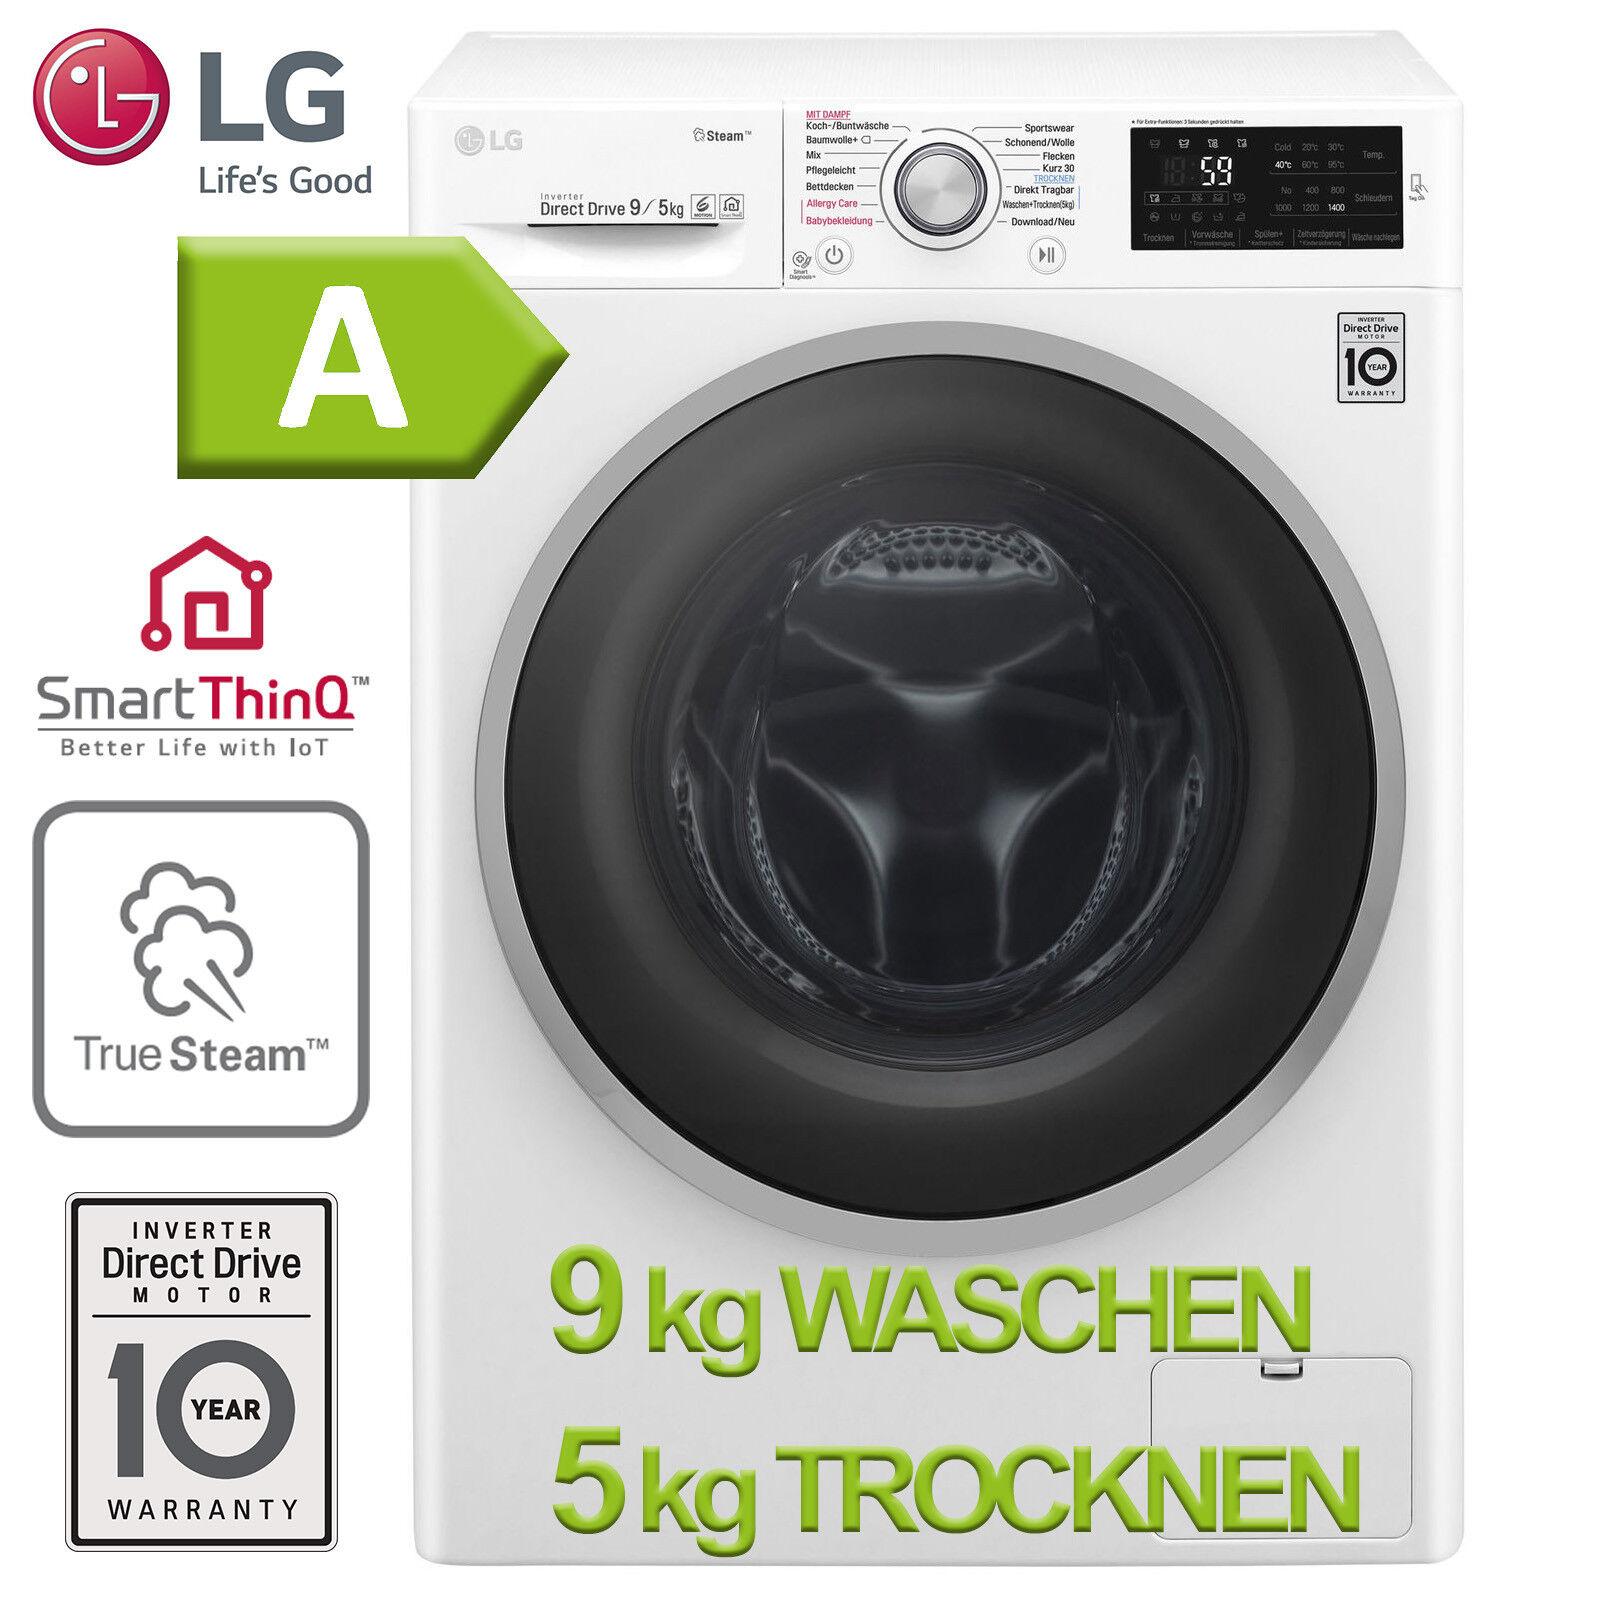 Waschtrockner 9+5 kg Waschmaschine Trockner A 2in1 Wäschetrockner LG Frontlader